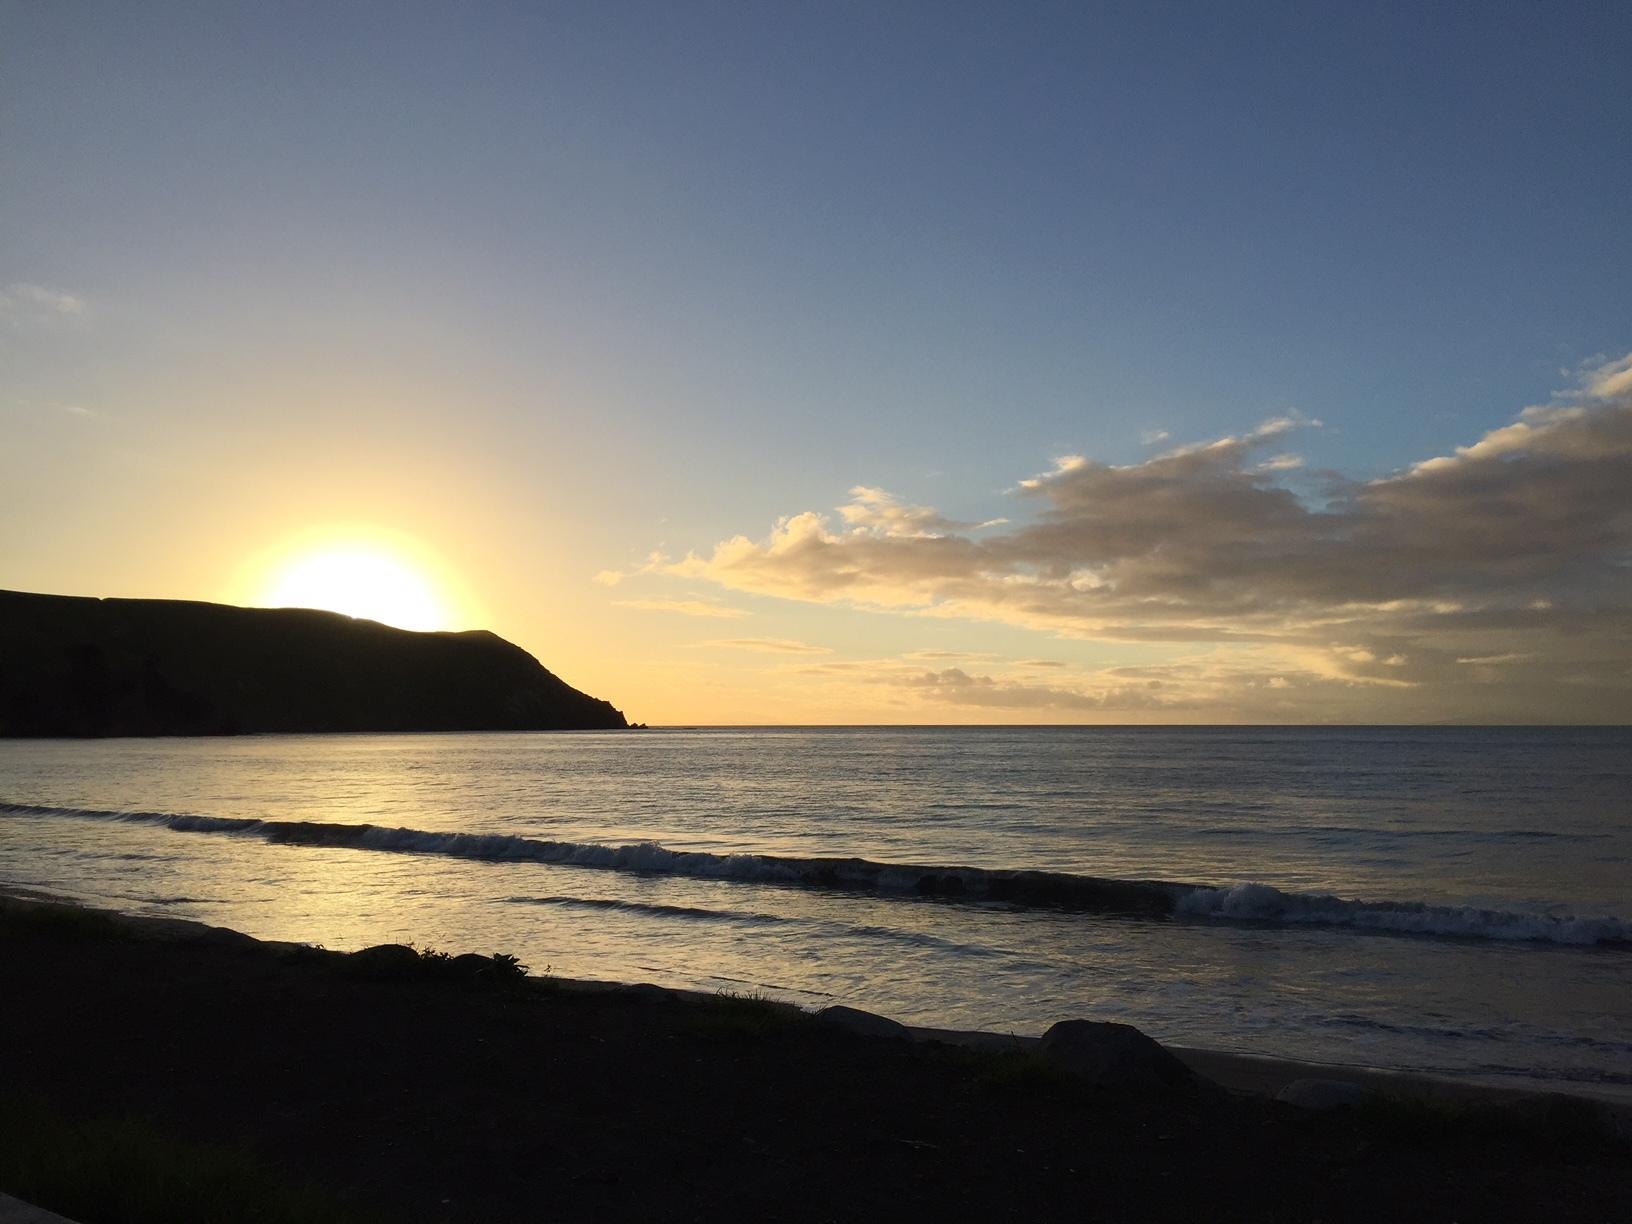 The Beautiful sunset at Port Jackson